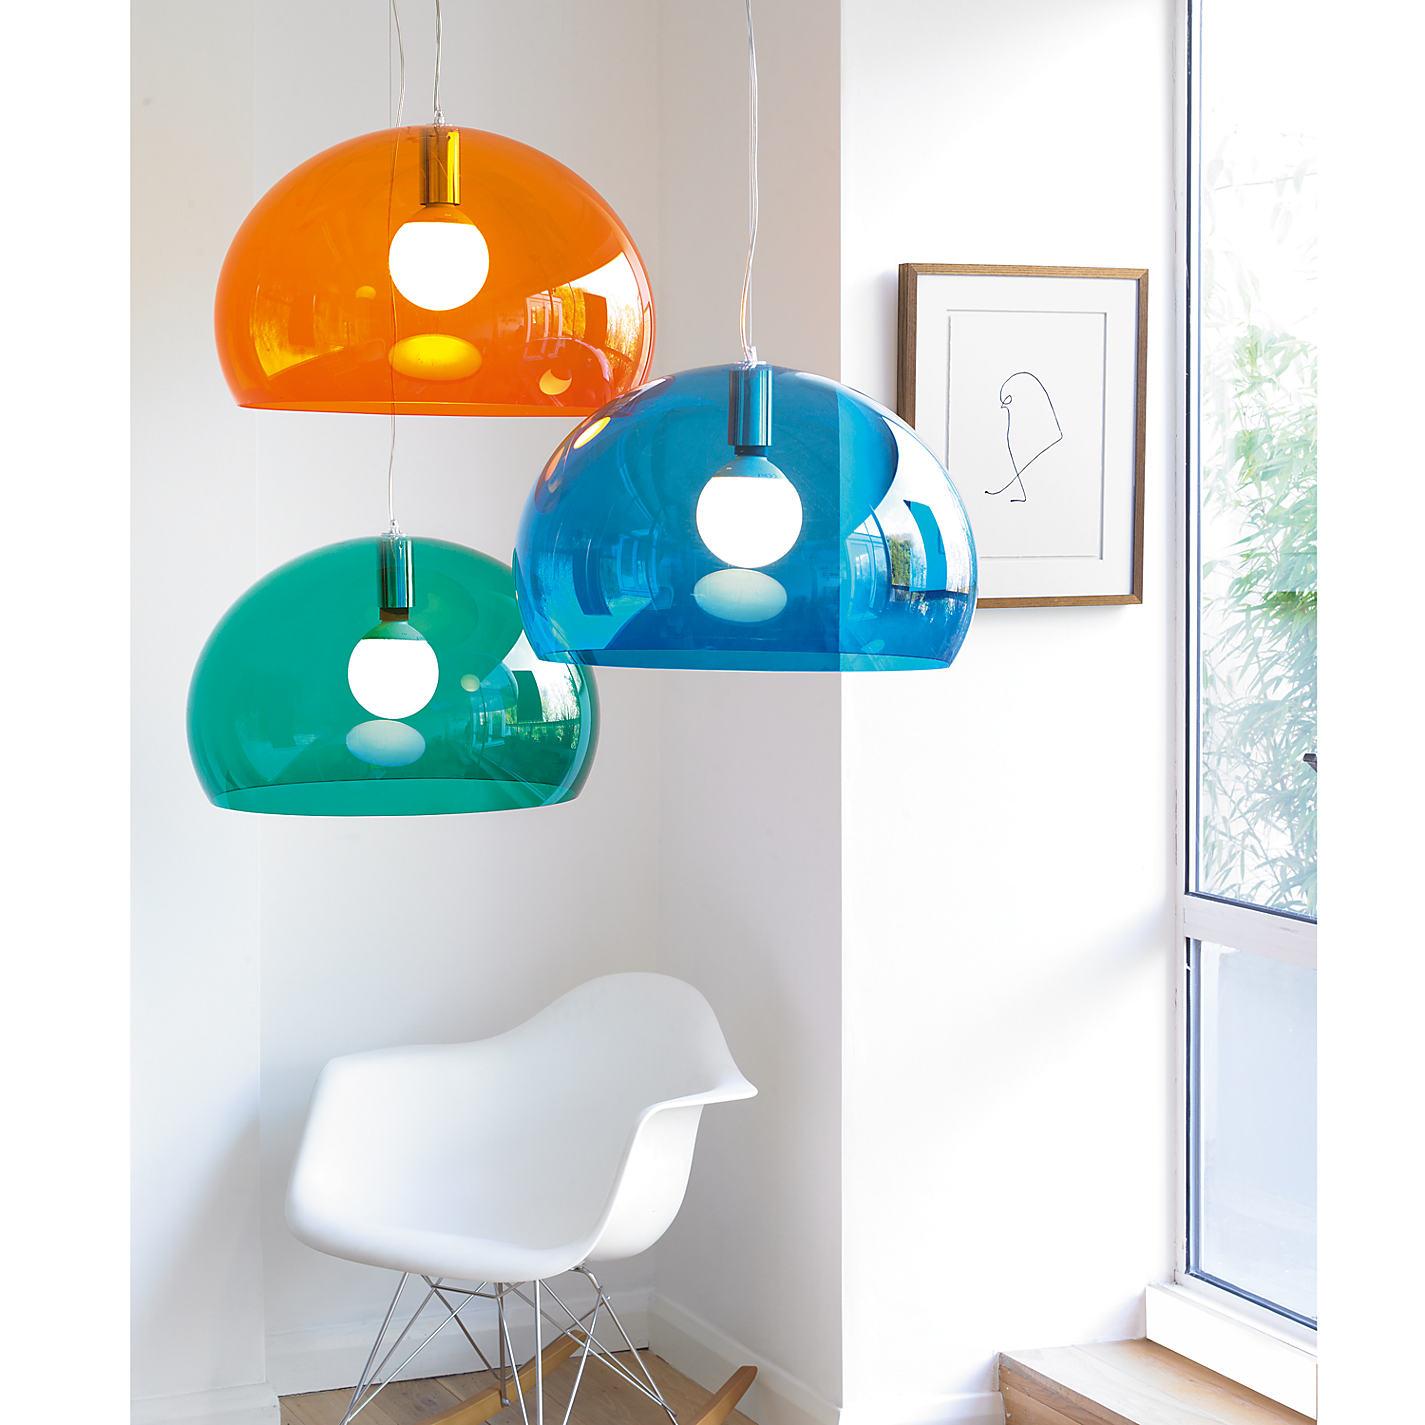 ferruccio laviani lighting. wonderful ferruccio laviani lighting the special transparency of material and sheen colors design inspiration f